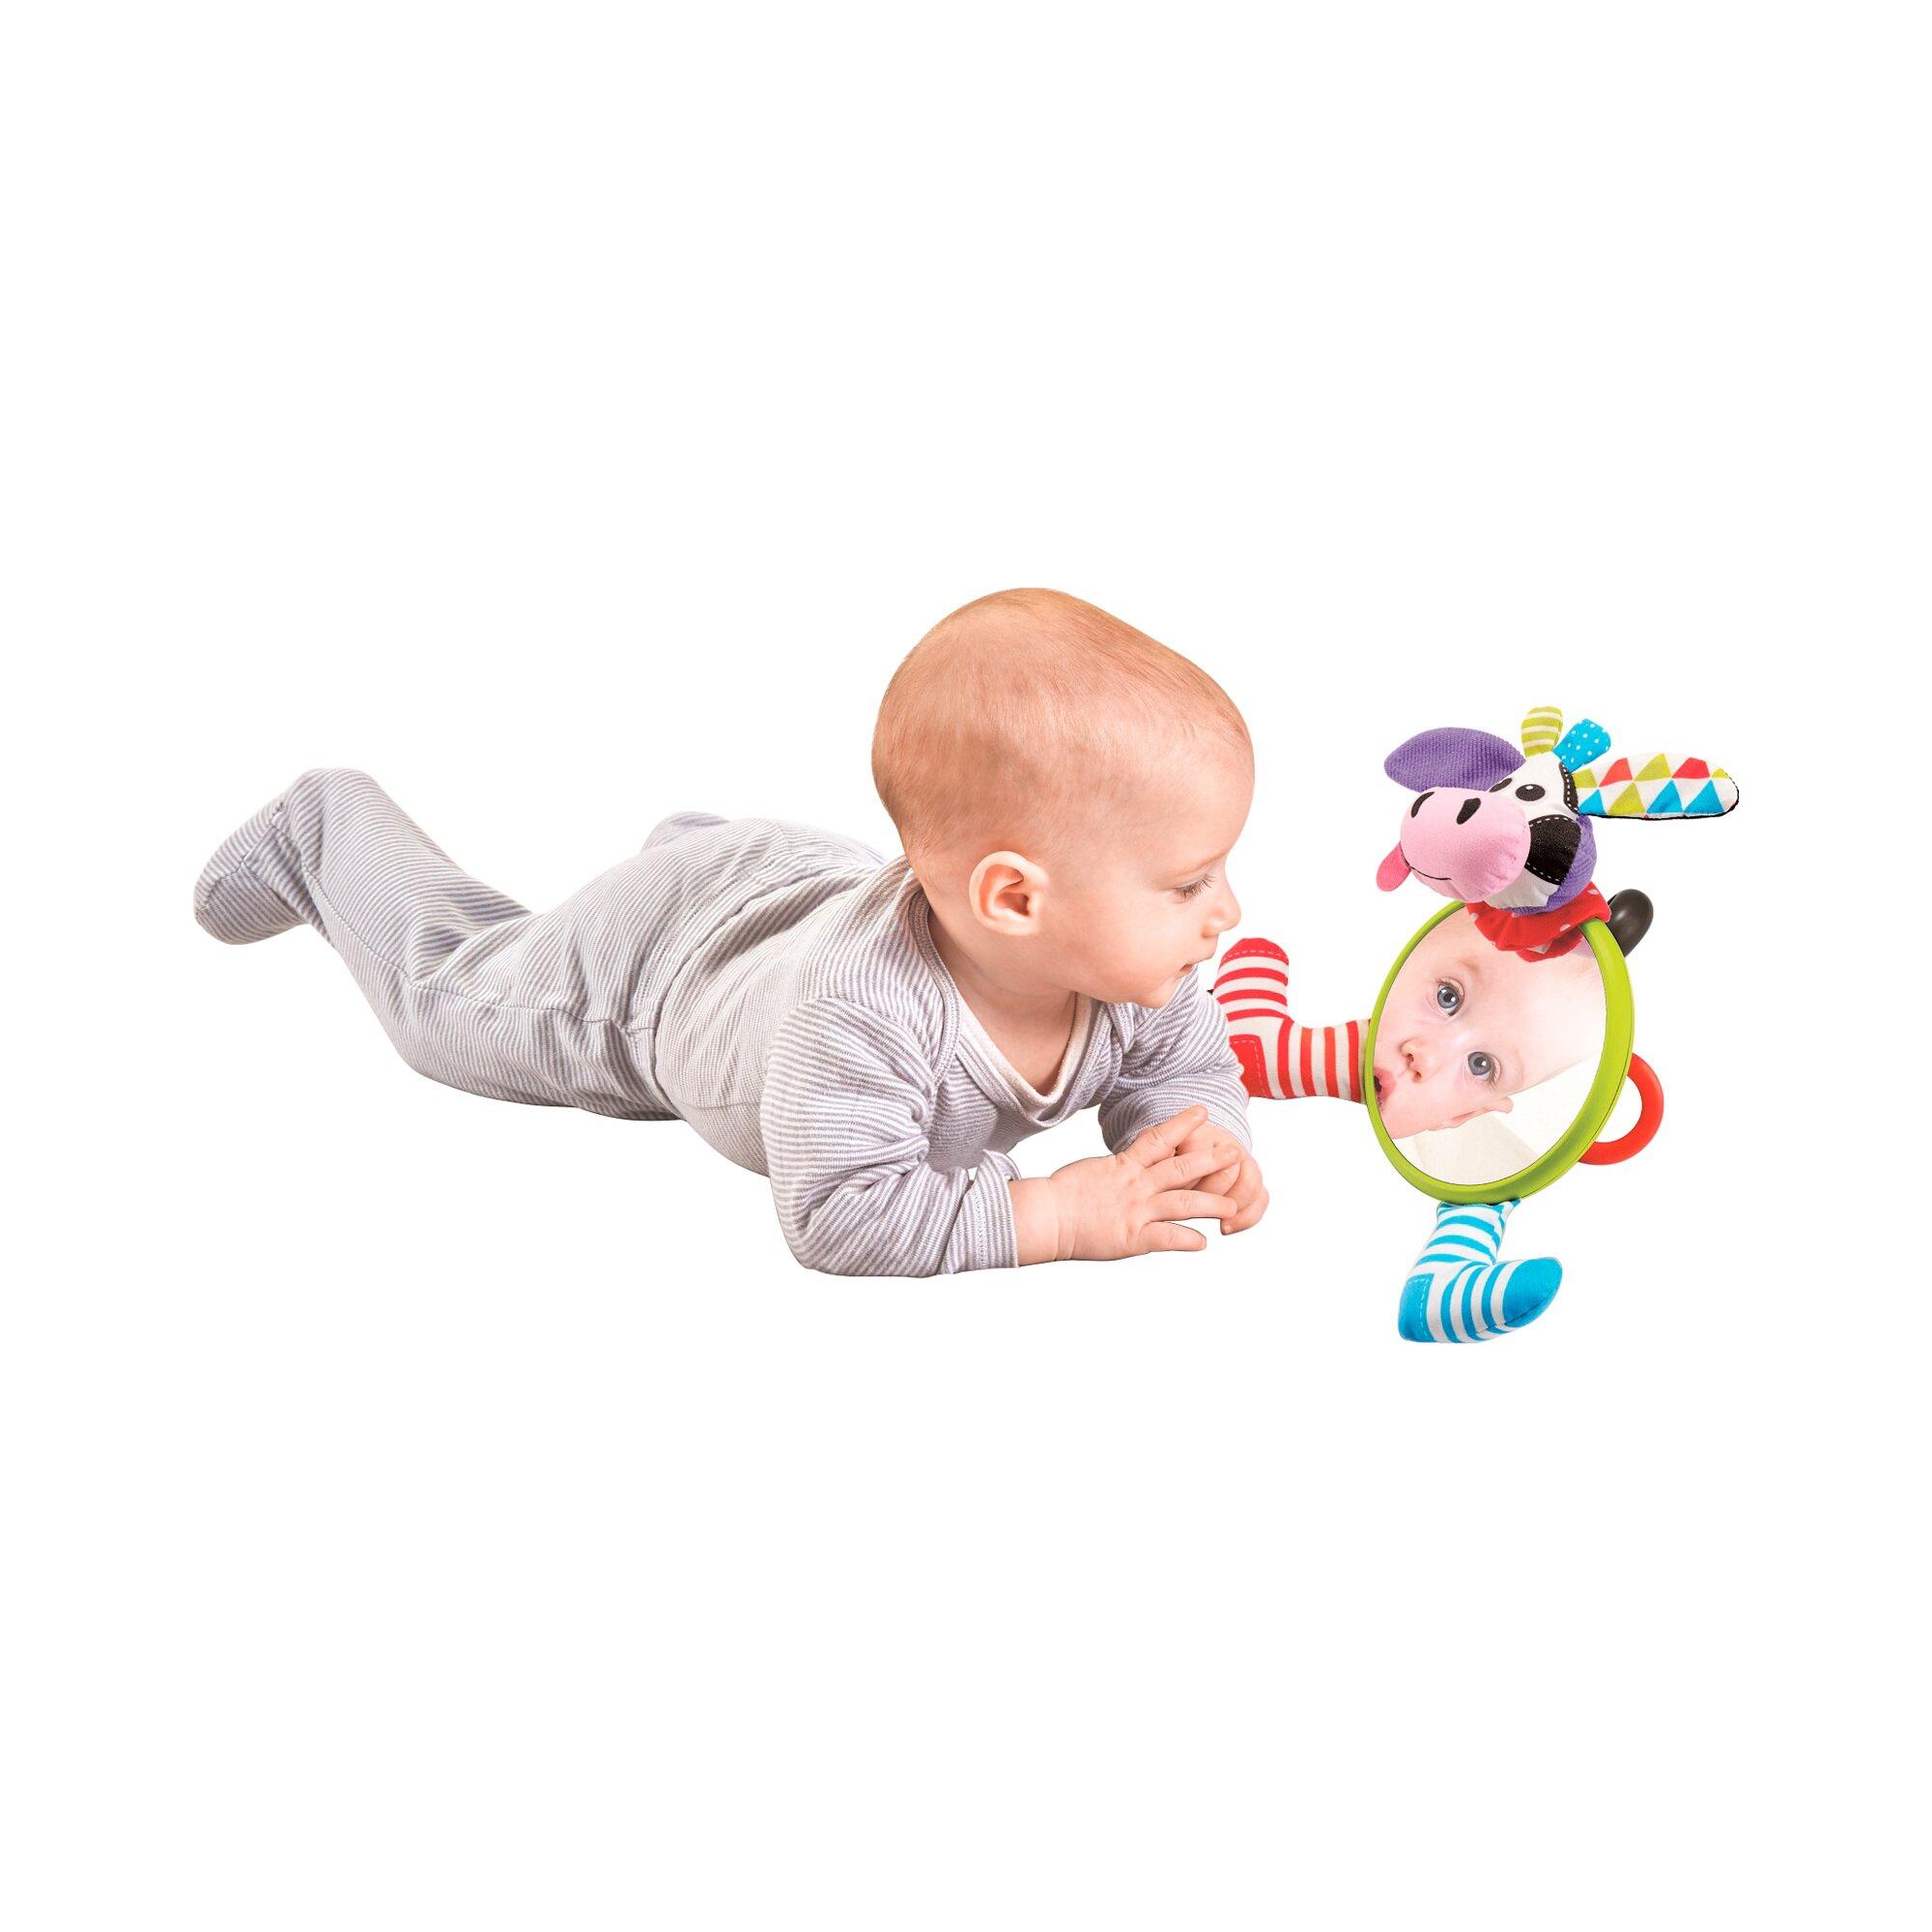 yookidoo-motorikspielzeug-spiegel-freund-kuh